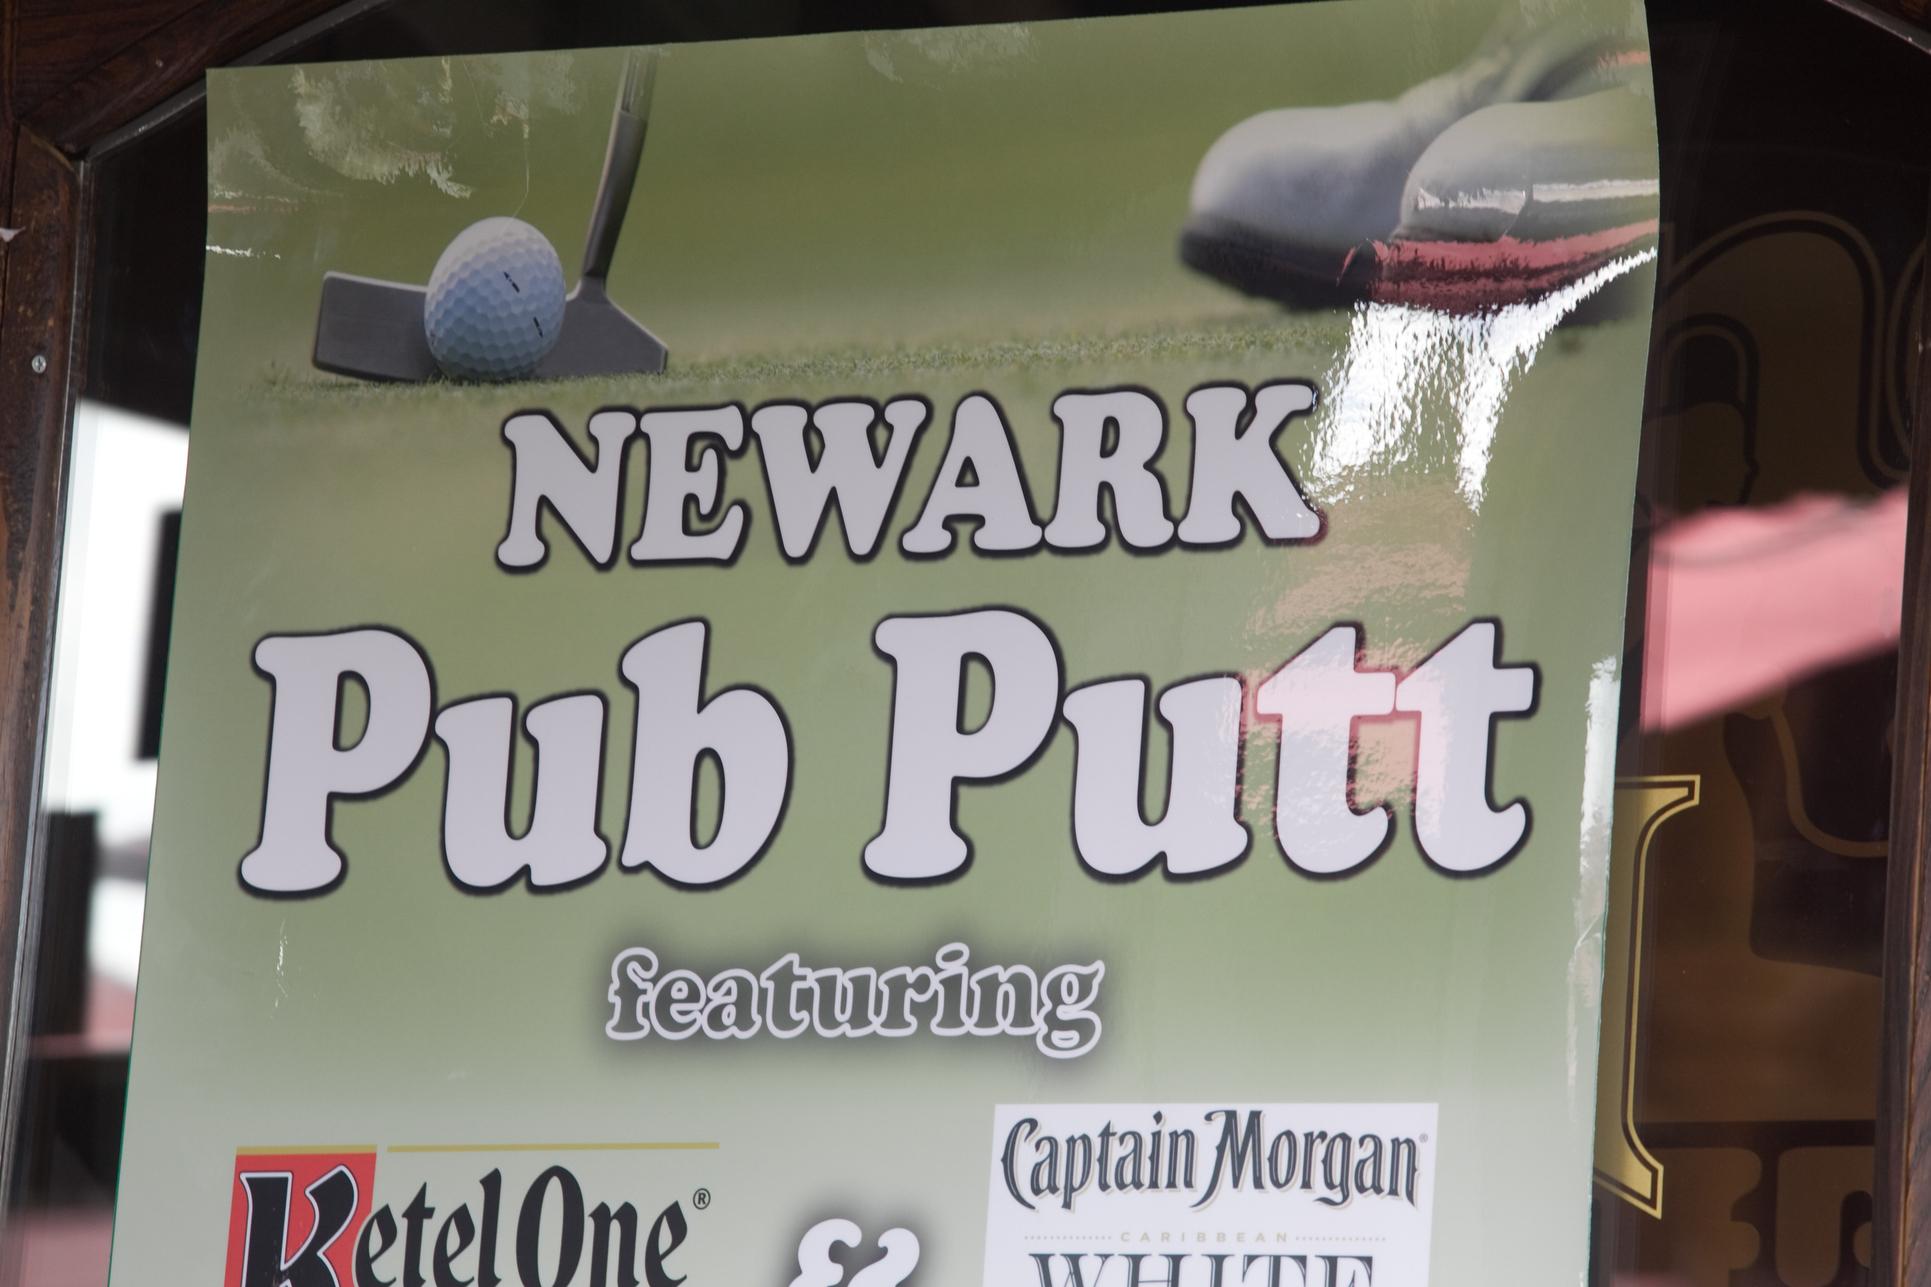 Delaware Jaycees Pub Putt in Newark, Delaware on September 20, 2014